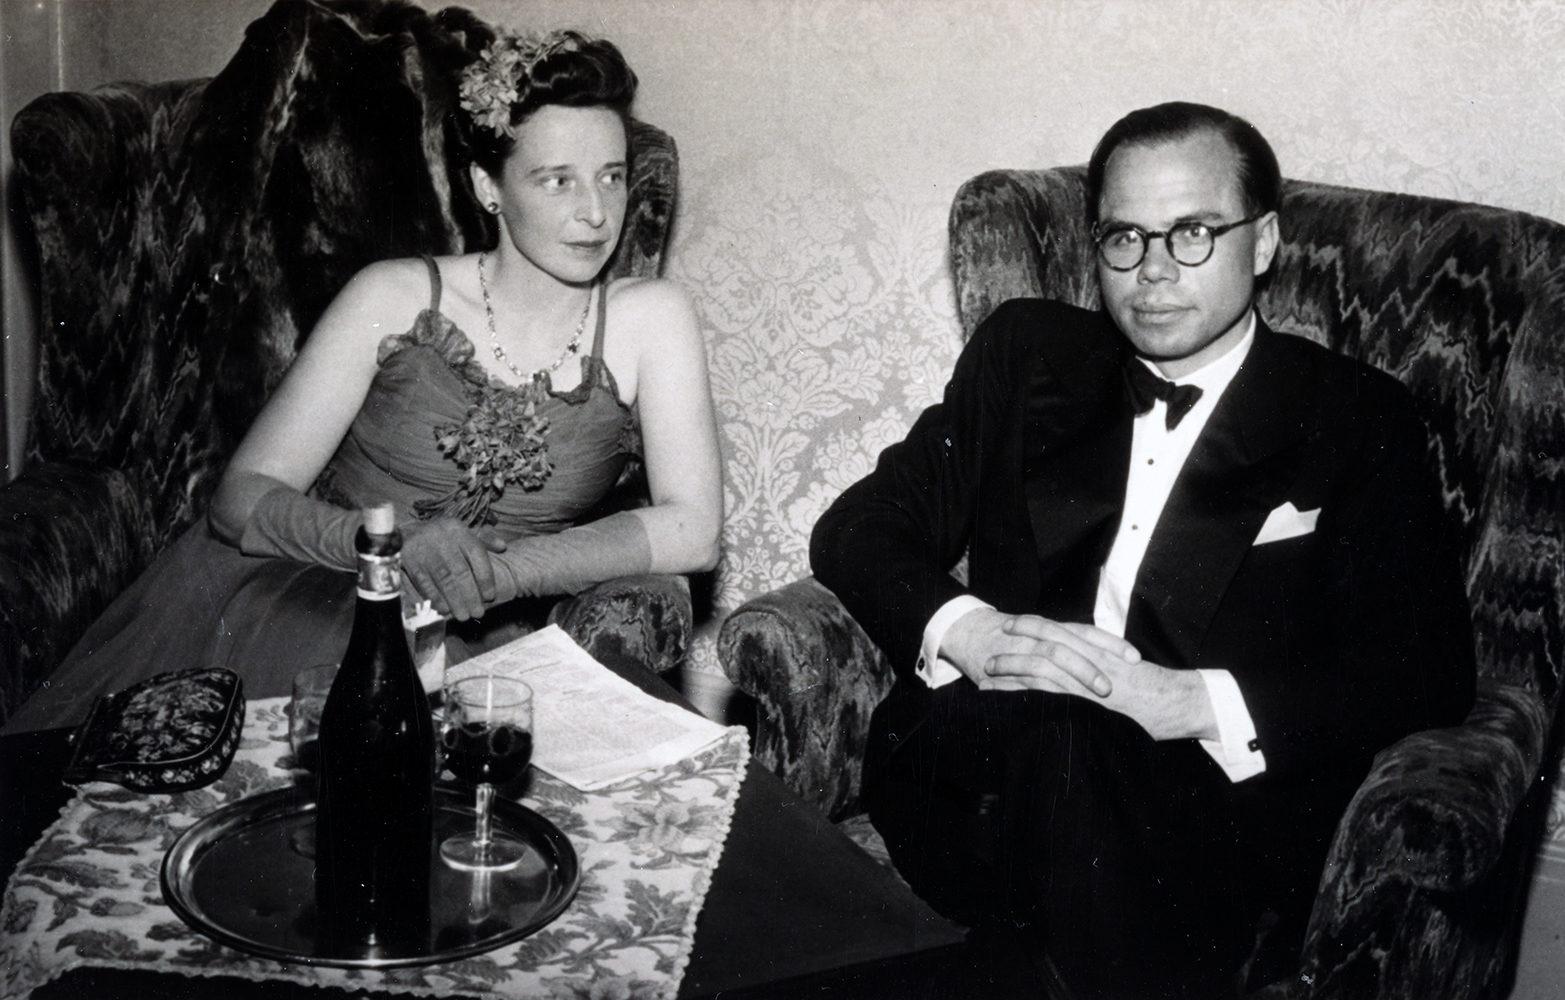 Walter Herdeg and his wife Kathleen in Grindelwald, 1940.